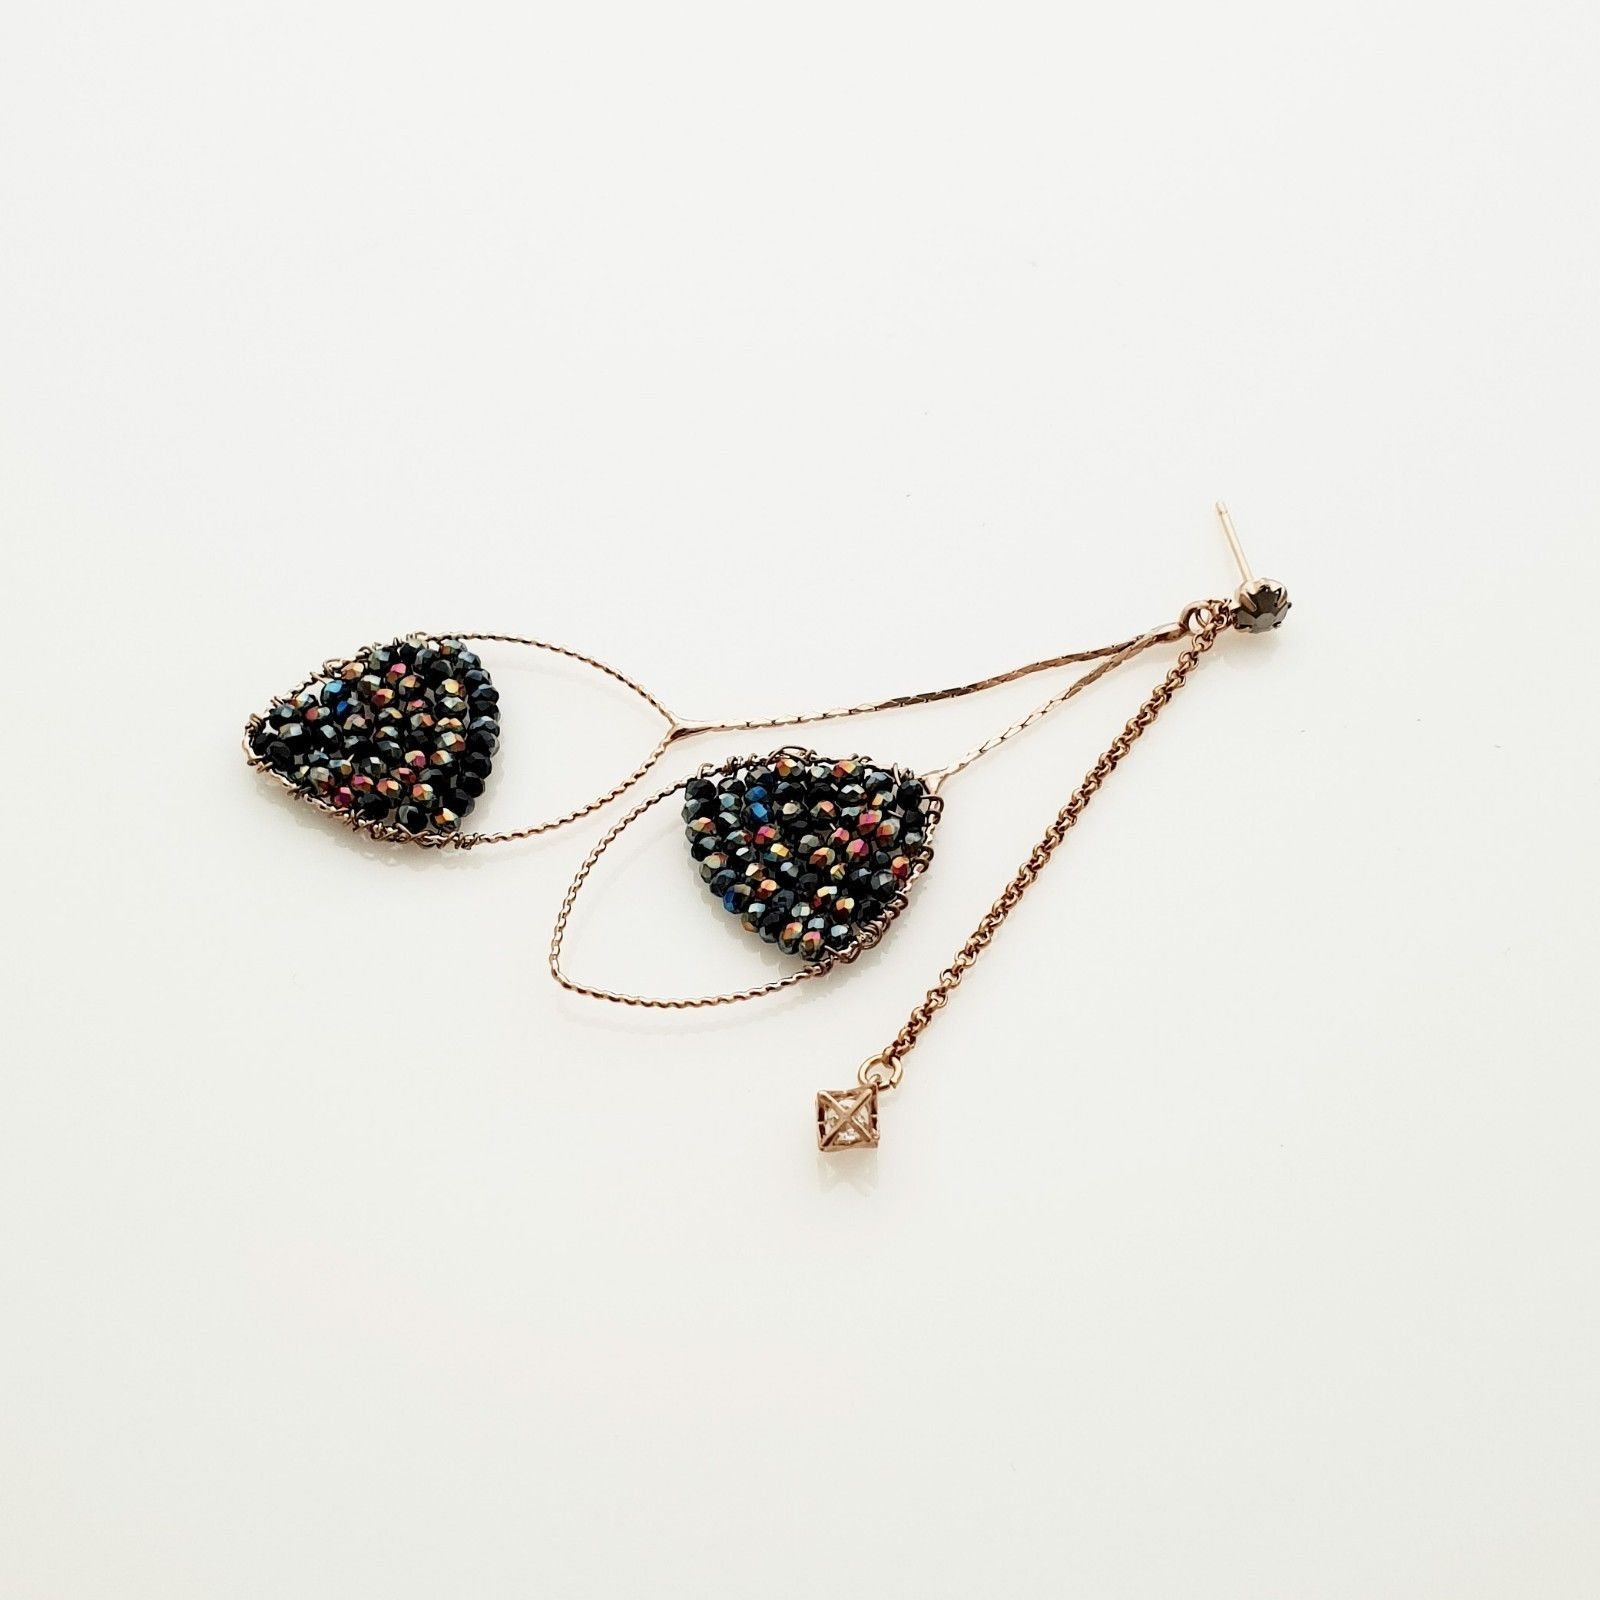 Handmade Oval Ellipse Made With Swarovski Stone Drop Dangle Earrings Brass E201 image 5